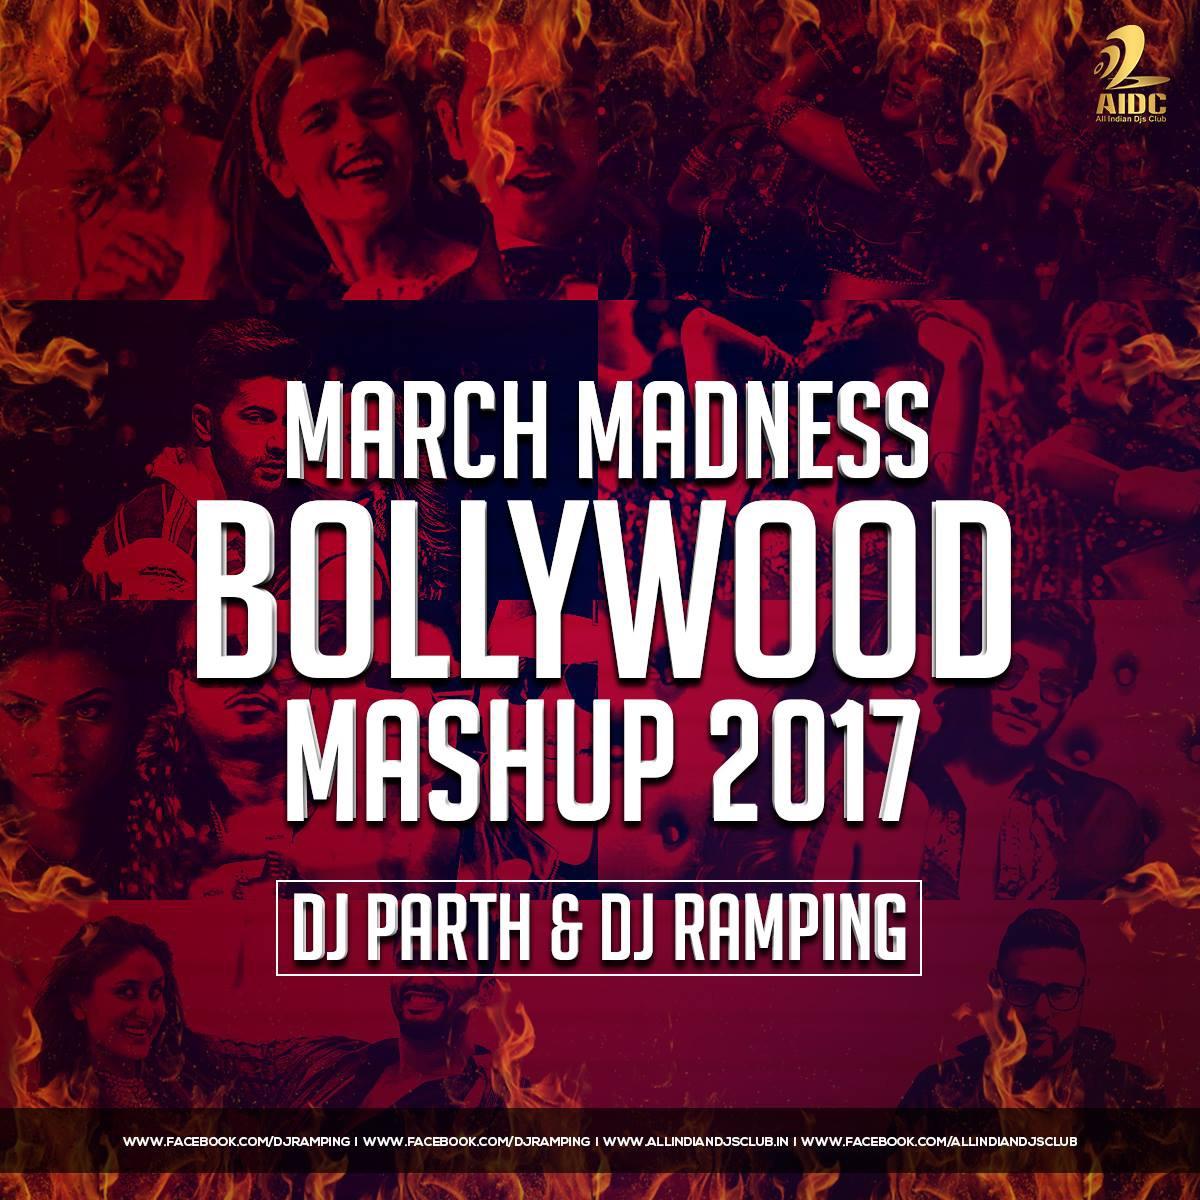 valentine mashup 2017 mp3 free download